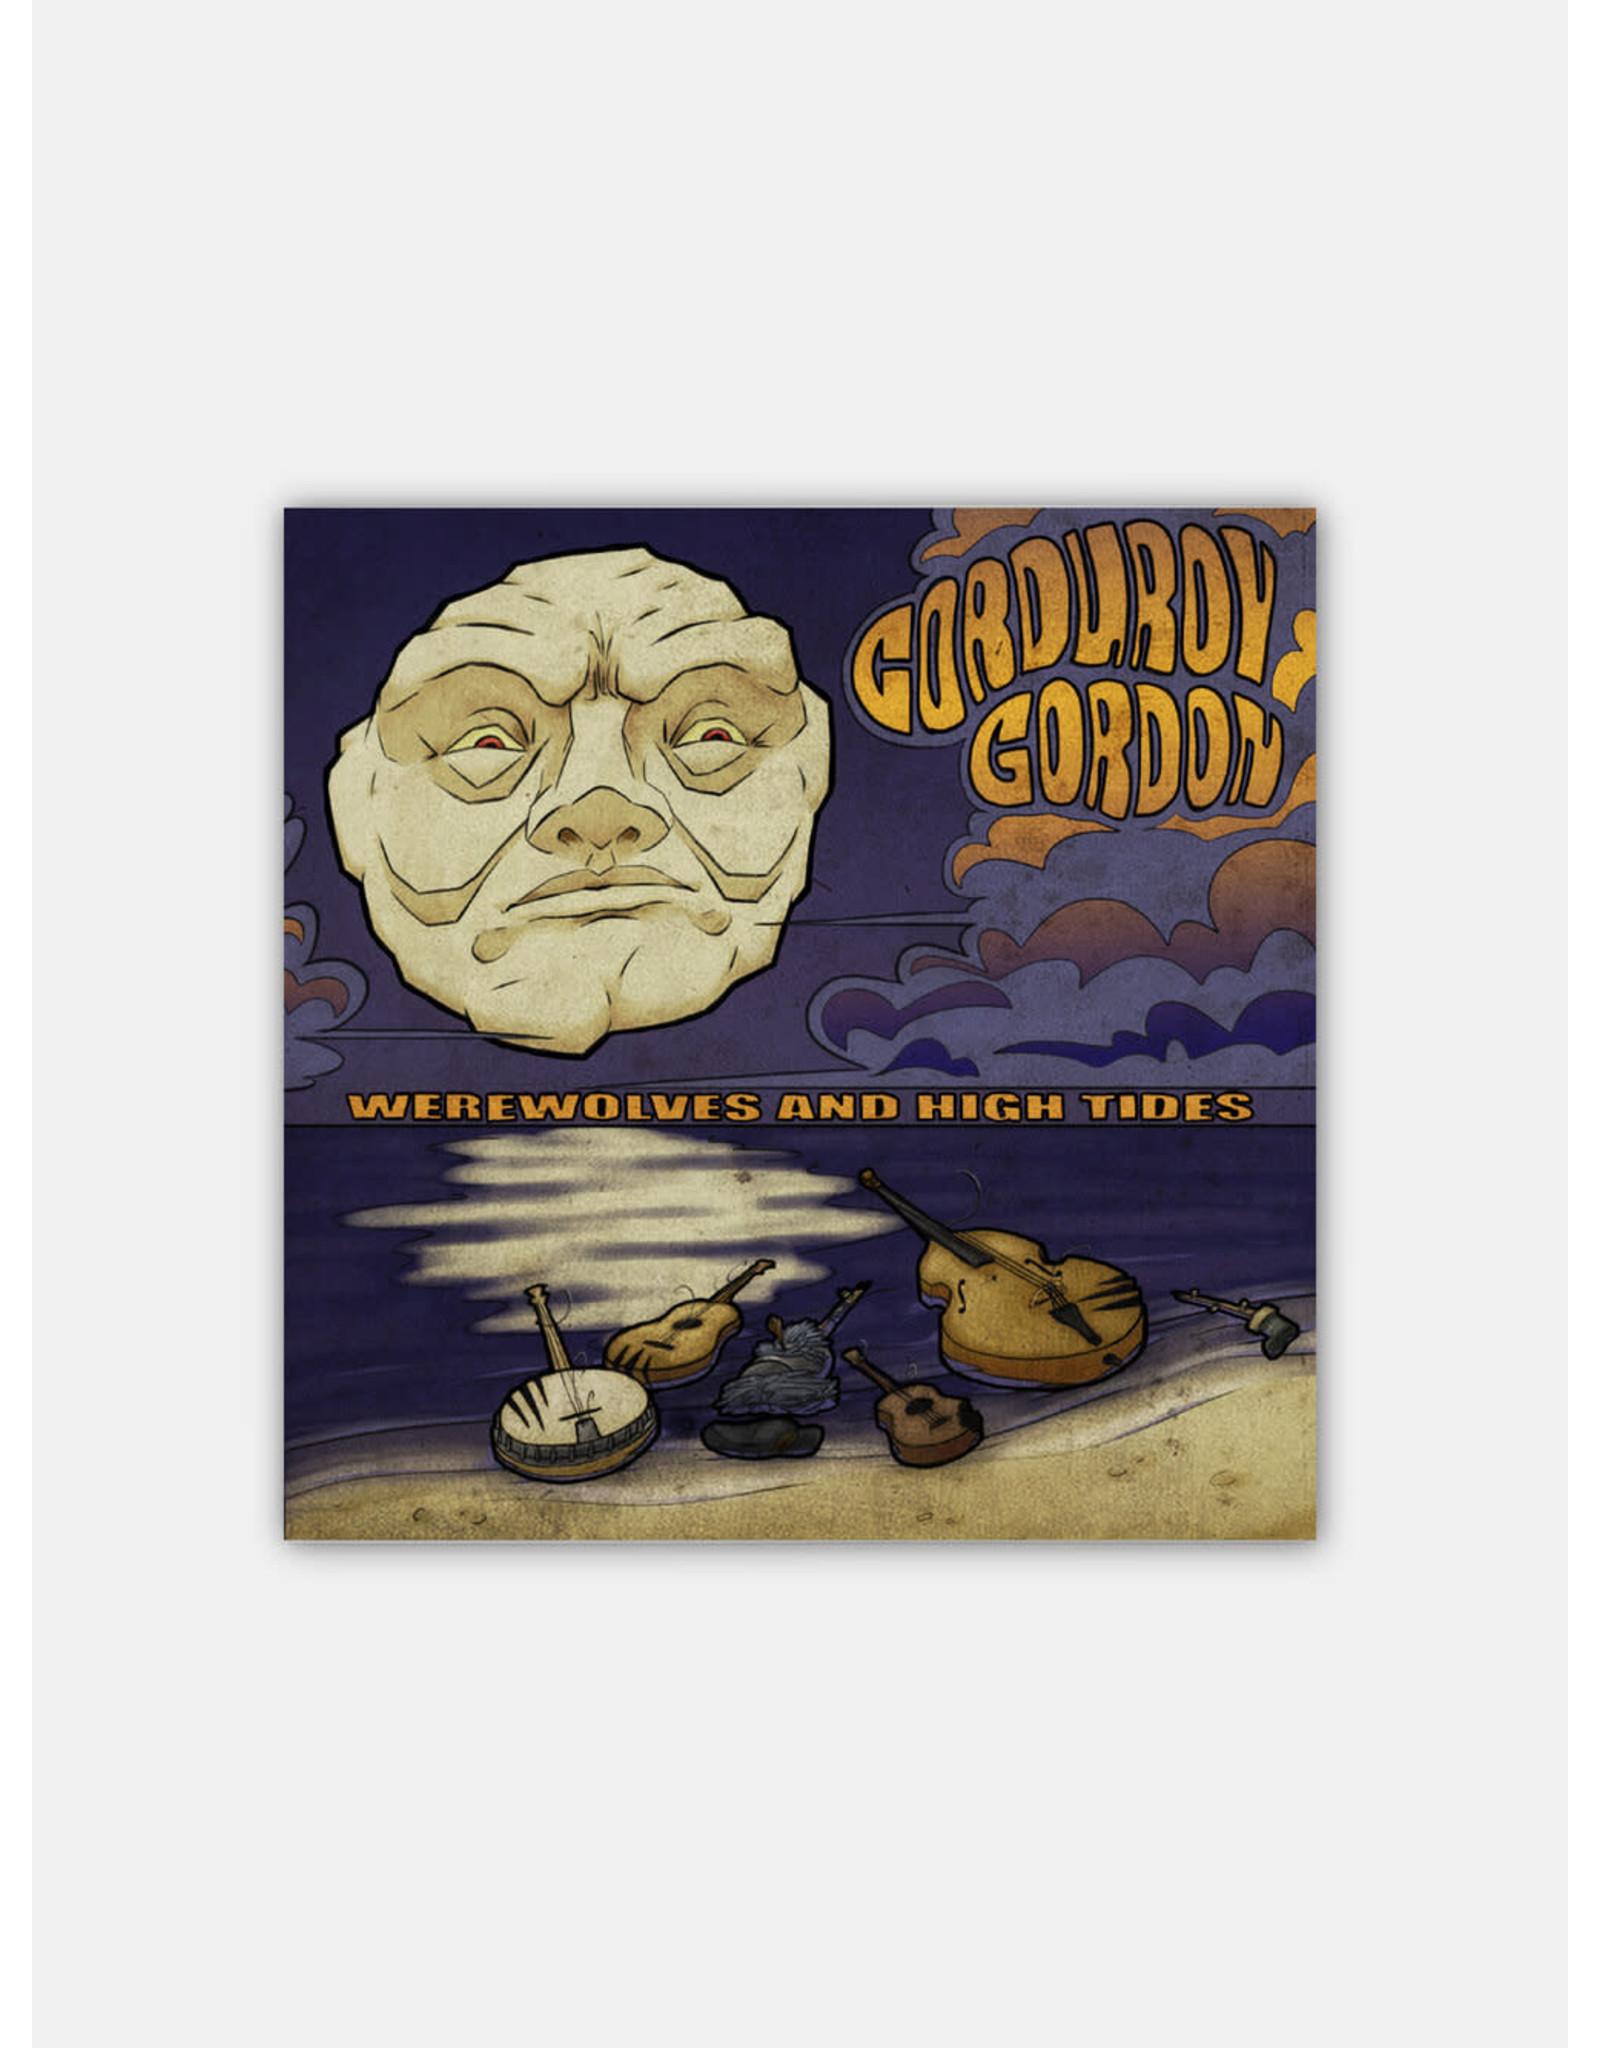 Corduroy Gordon - Werewolves And High Tides LP